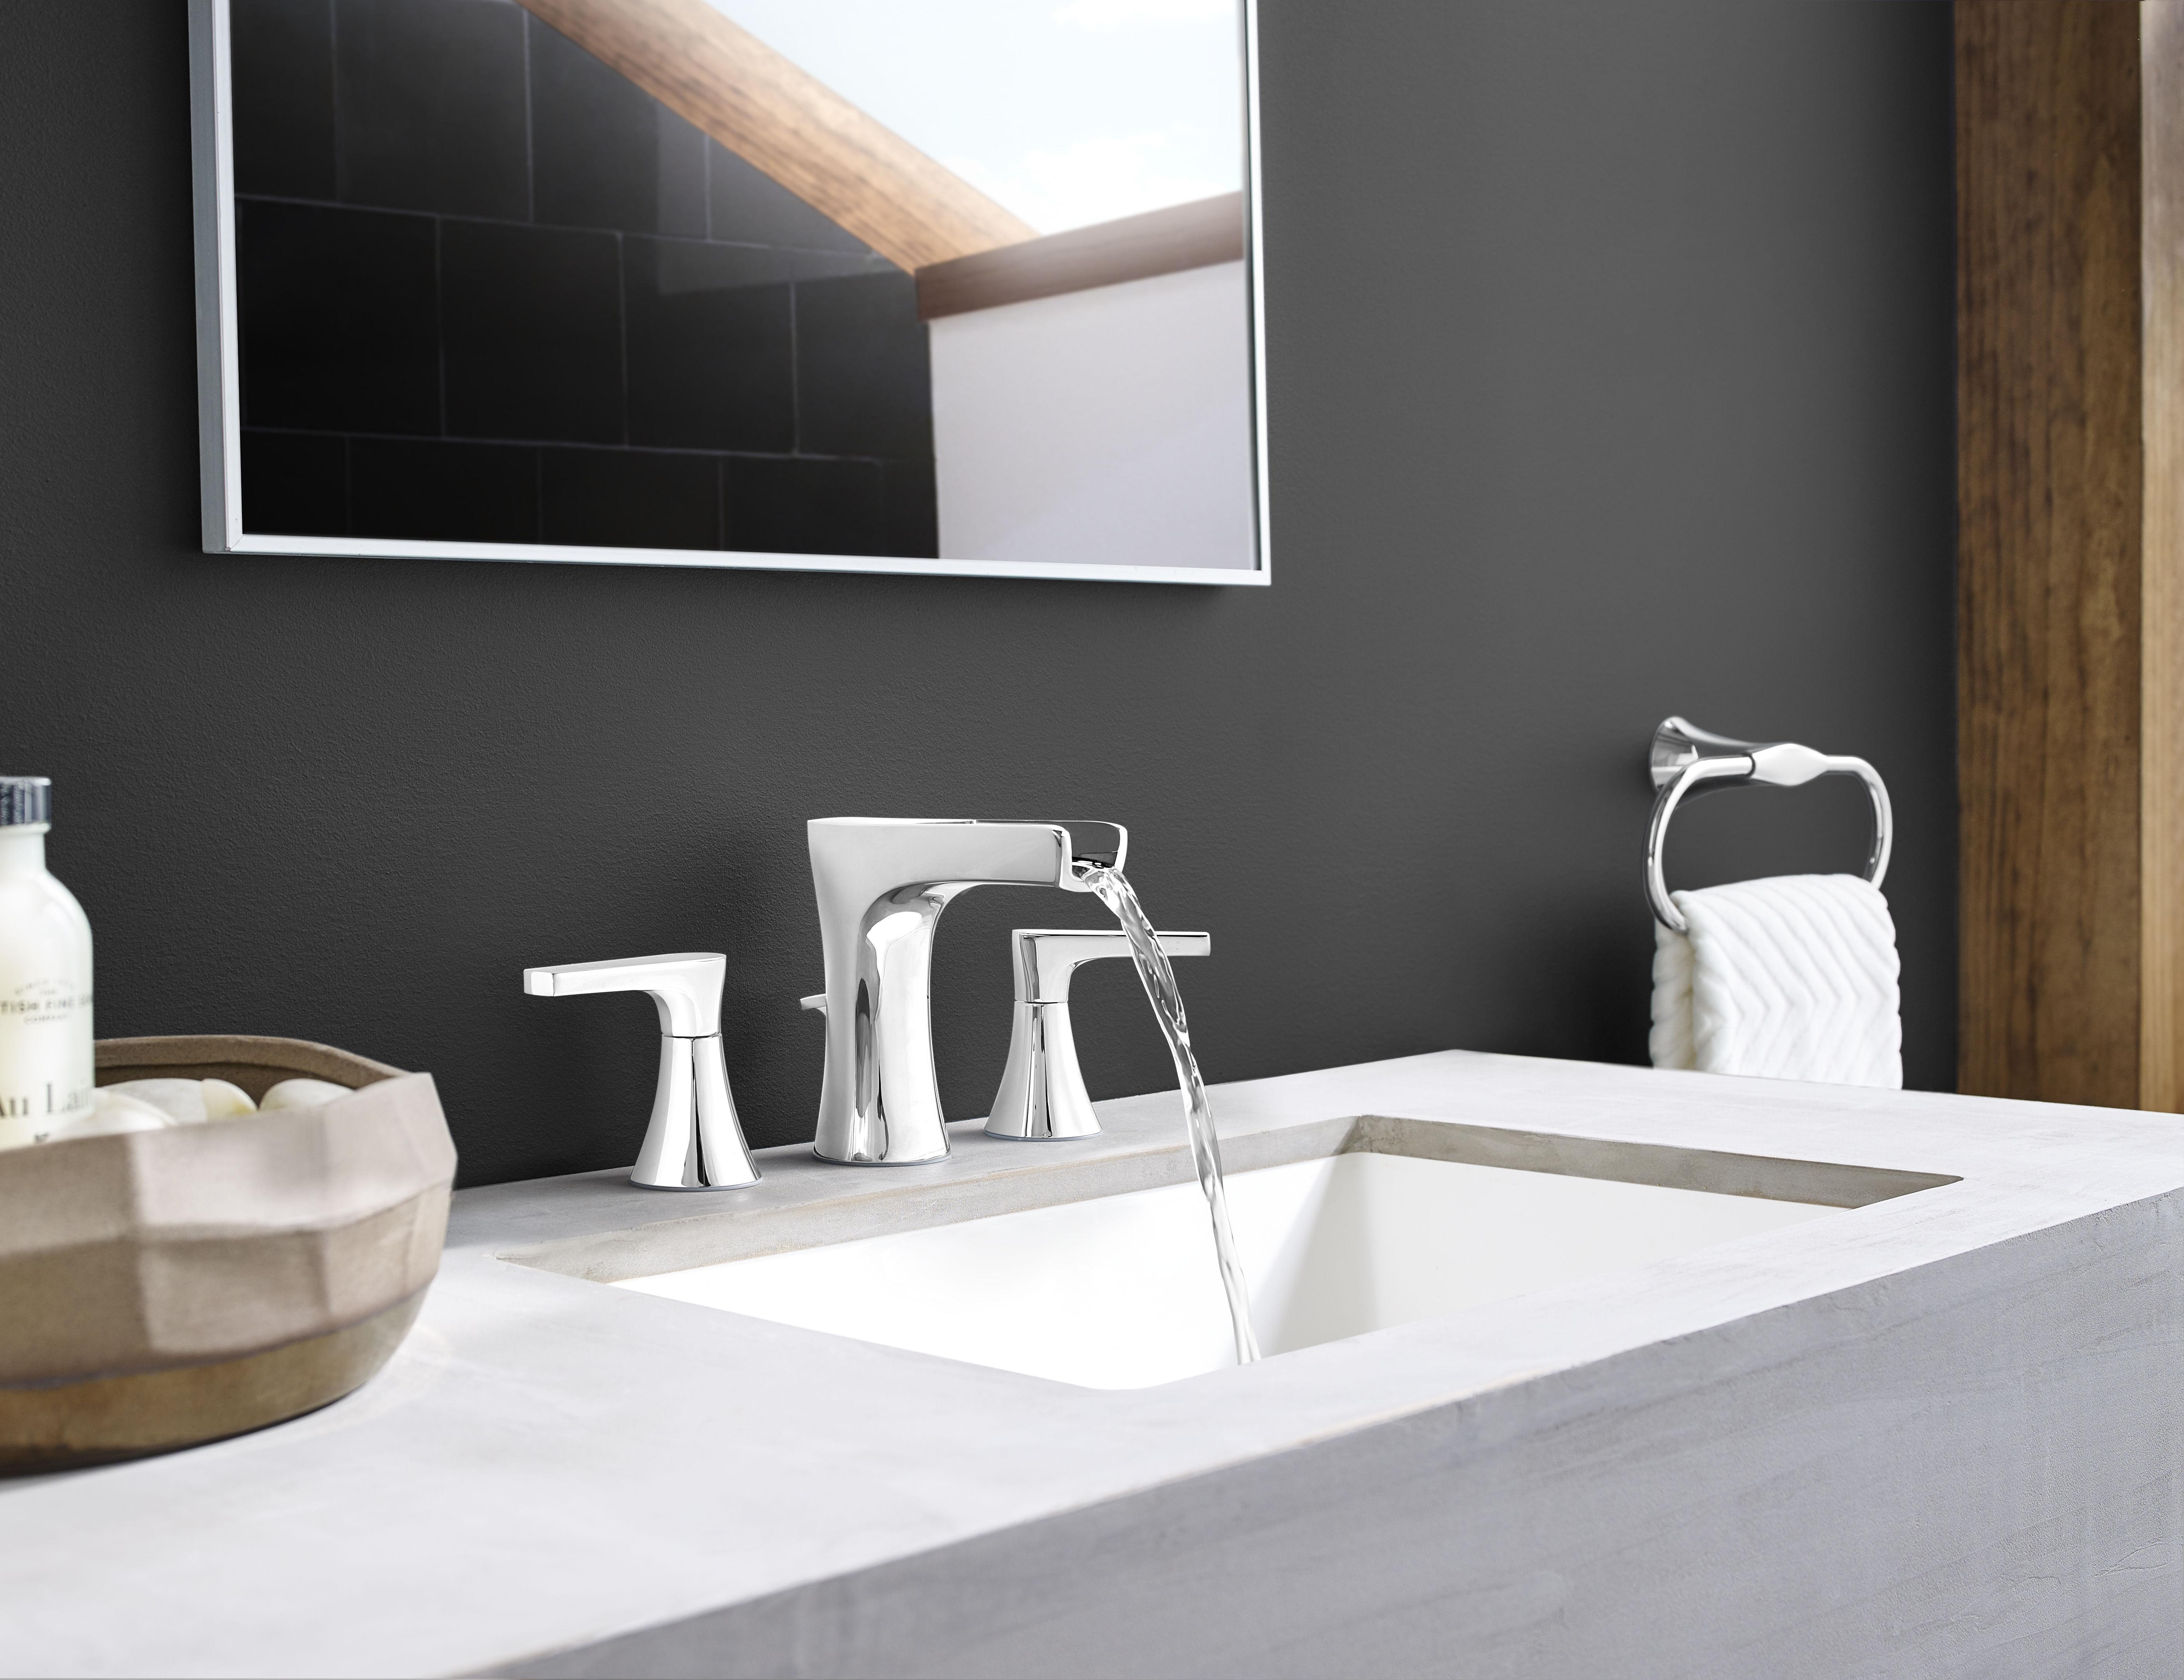 Pfister LG49-MF1K Brushed Nickel Kelen Widespread Bathroom Faucet ...